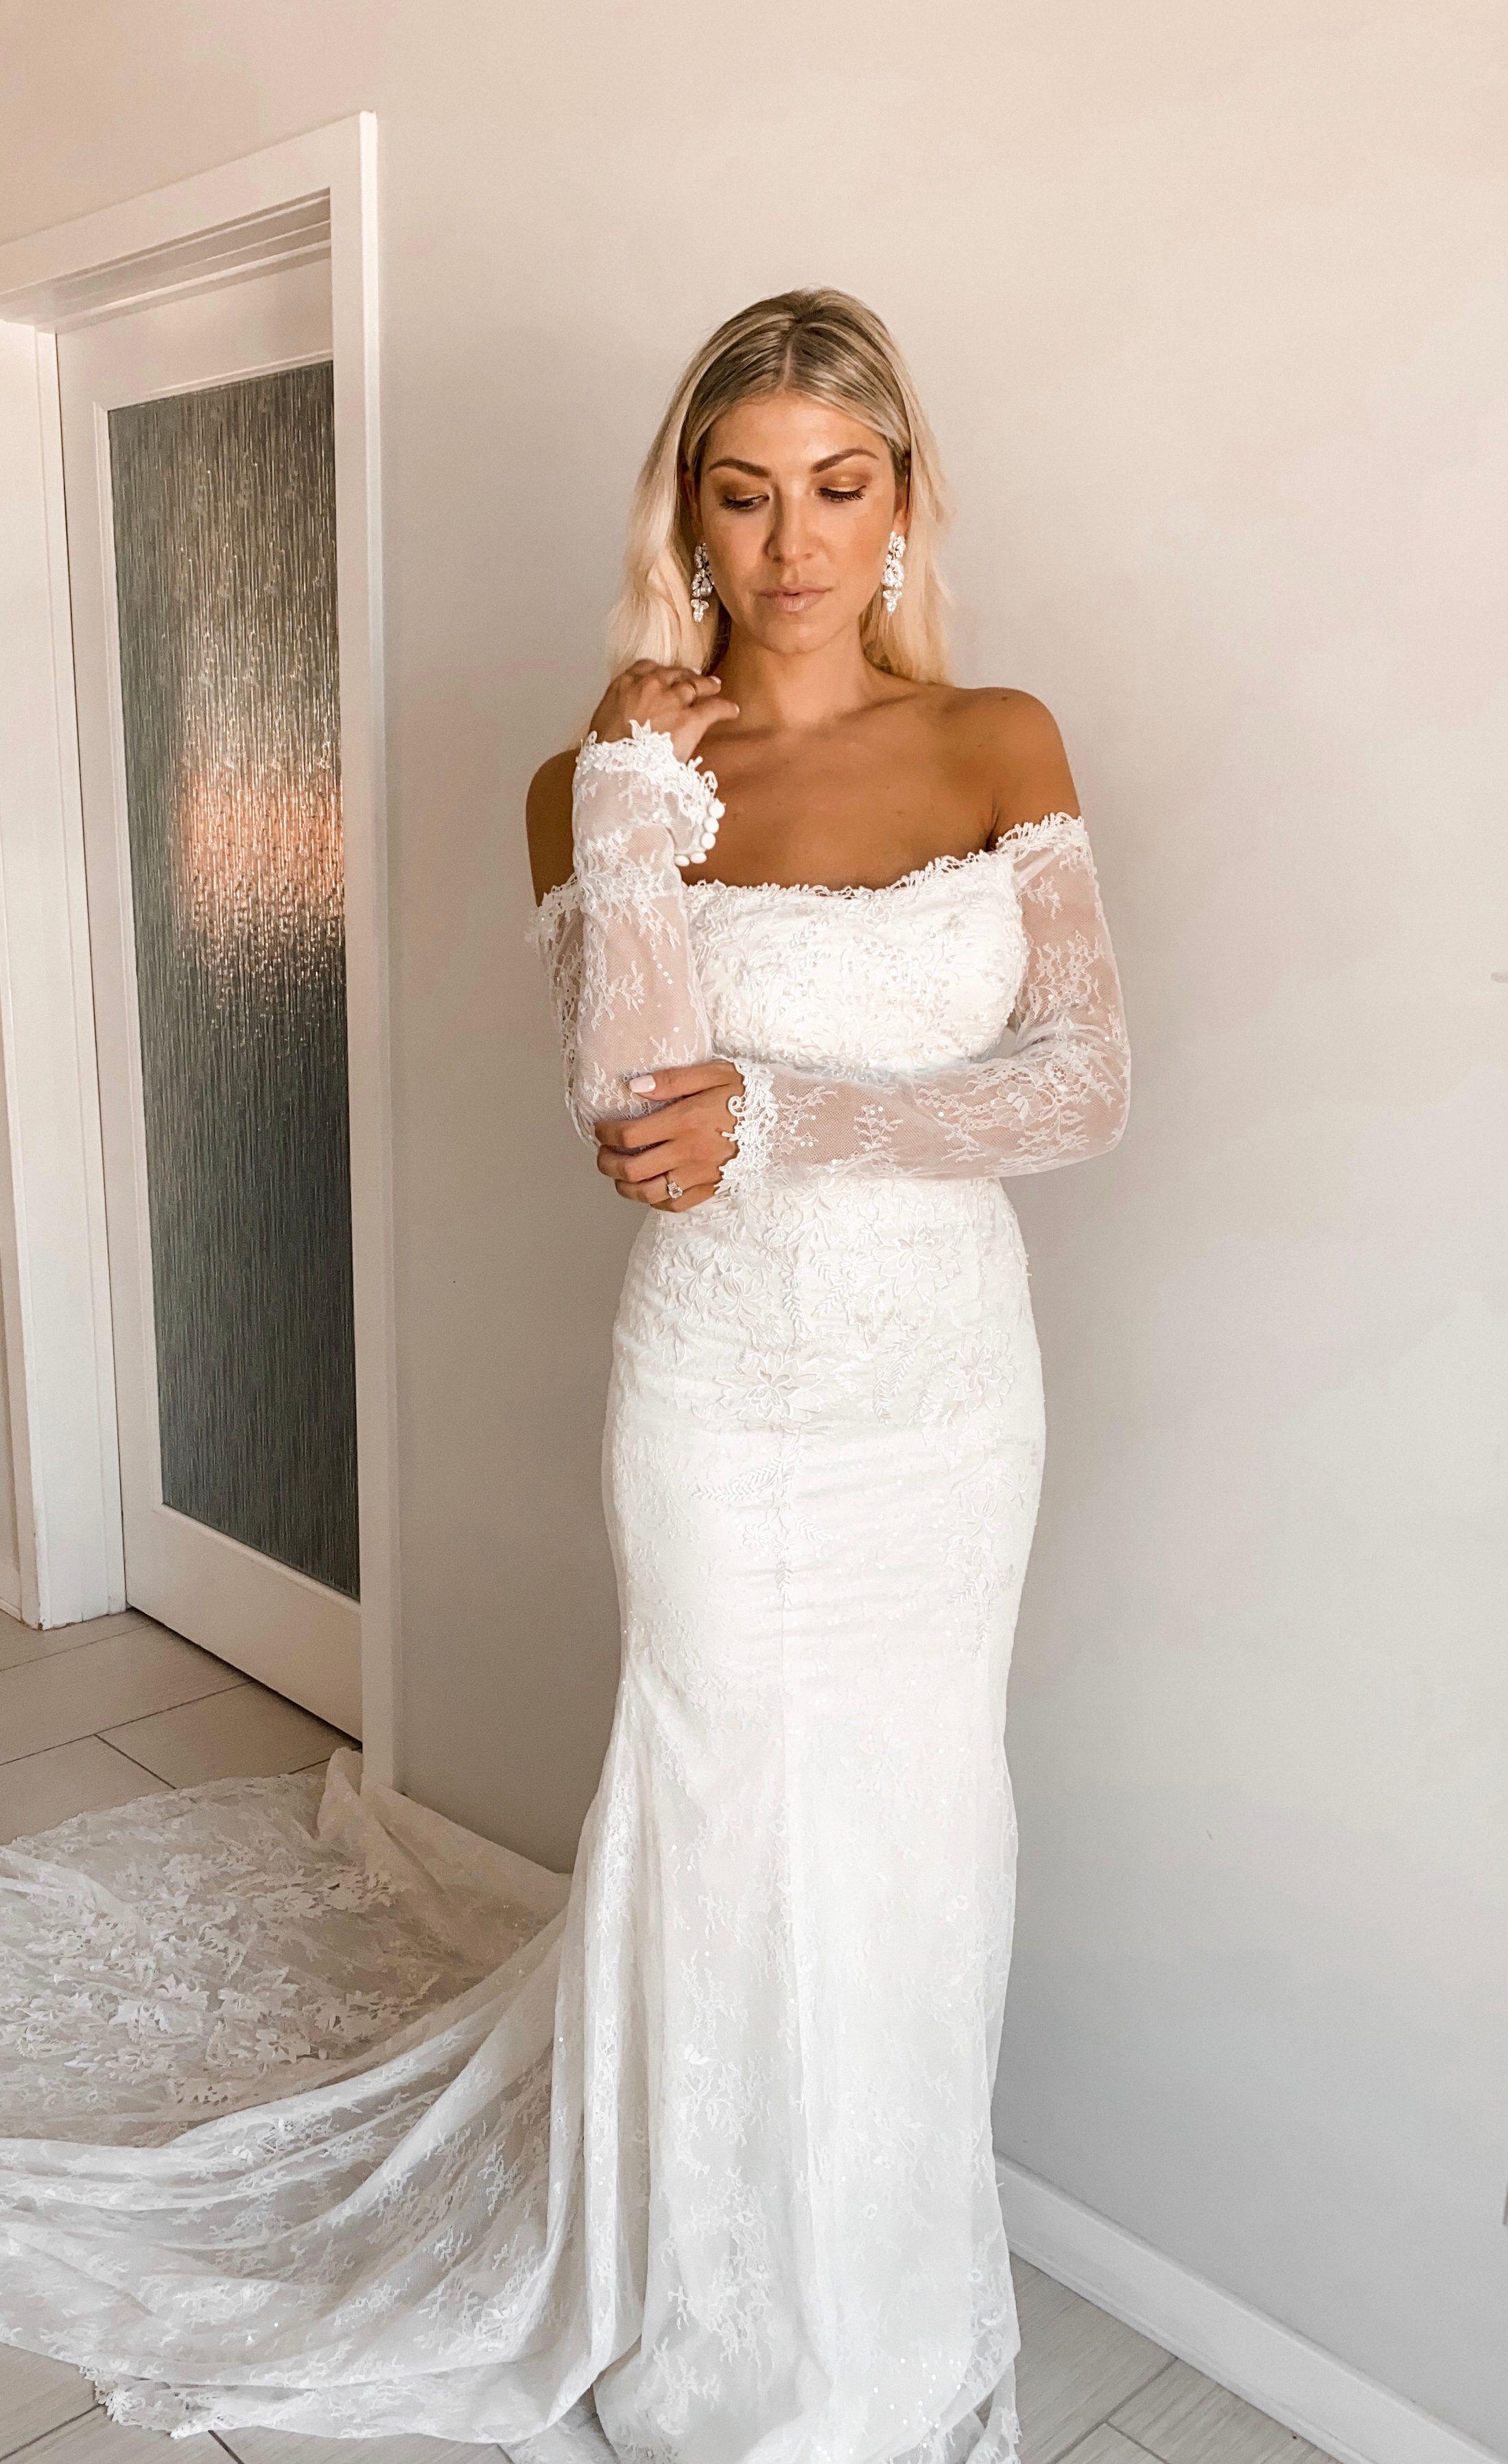 Long Sleeve Off Shoulder Sequin Lace Wedding Dress David S Bridal Davids Bridal Wedding Dresses Sequin Lace Wedding Dress Long Sleeve Wedding Dress Lace [ 3592 x 2198 Pixel ]